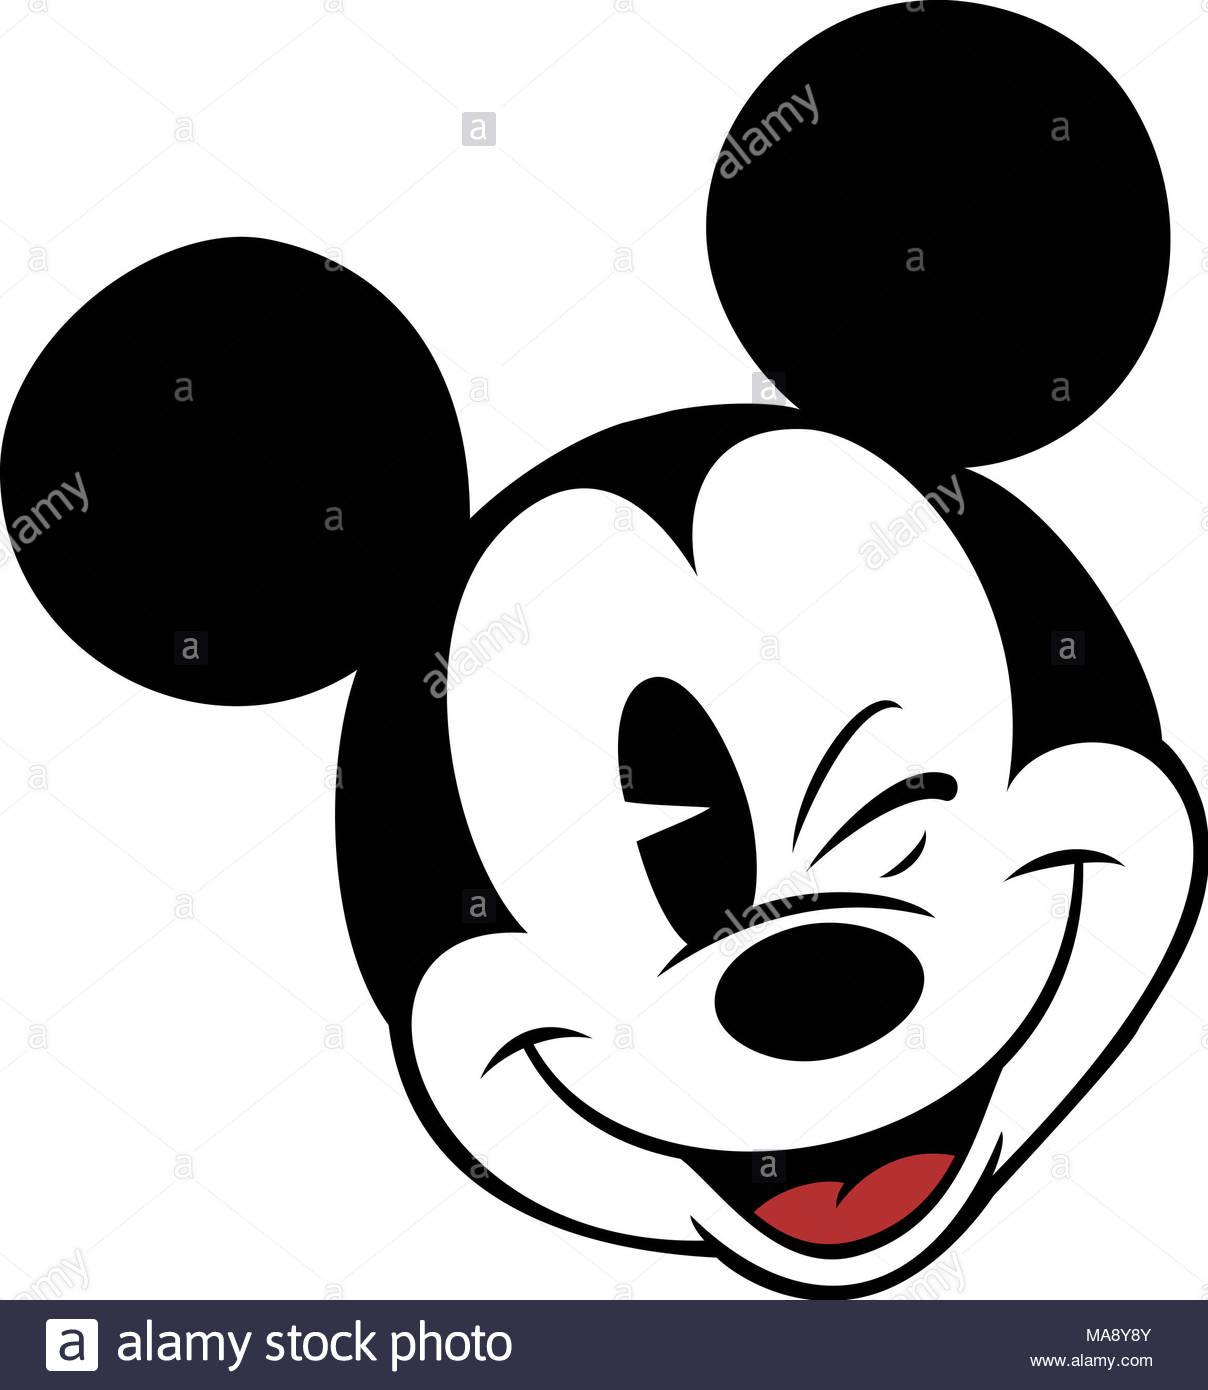 Mickey Mouse Head Character Cartoon Winking Eye Illustration Vintage Luggage Tag